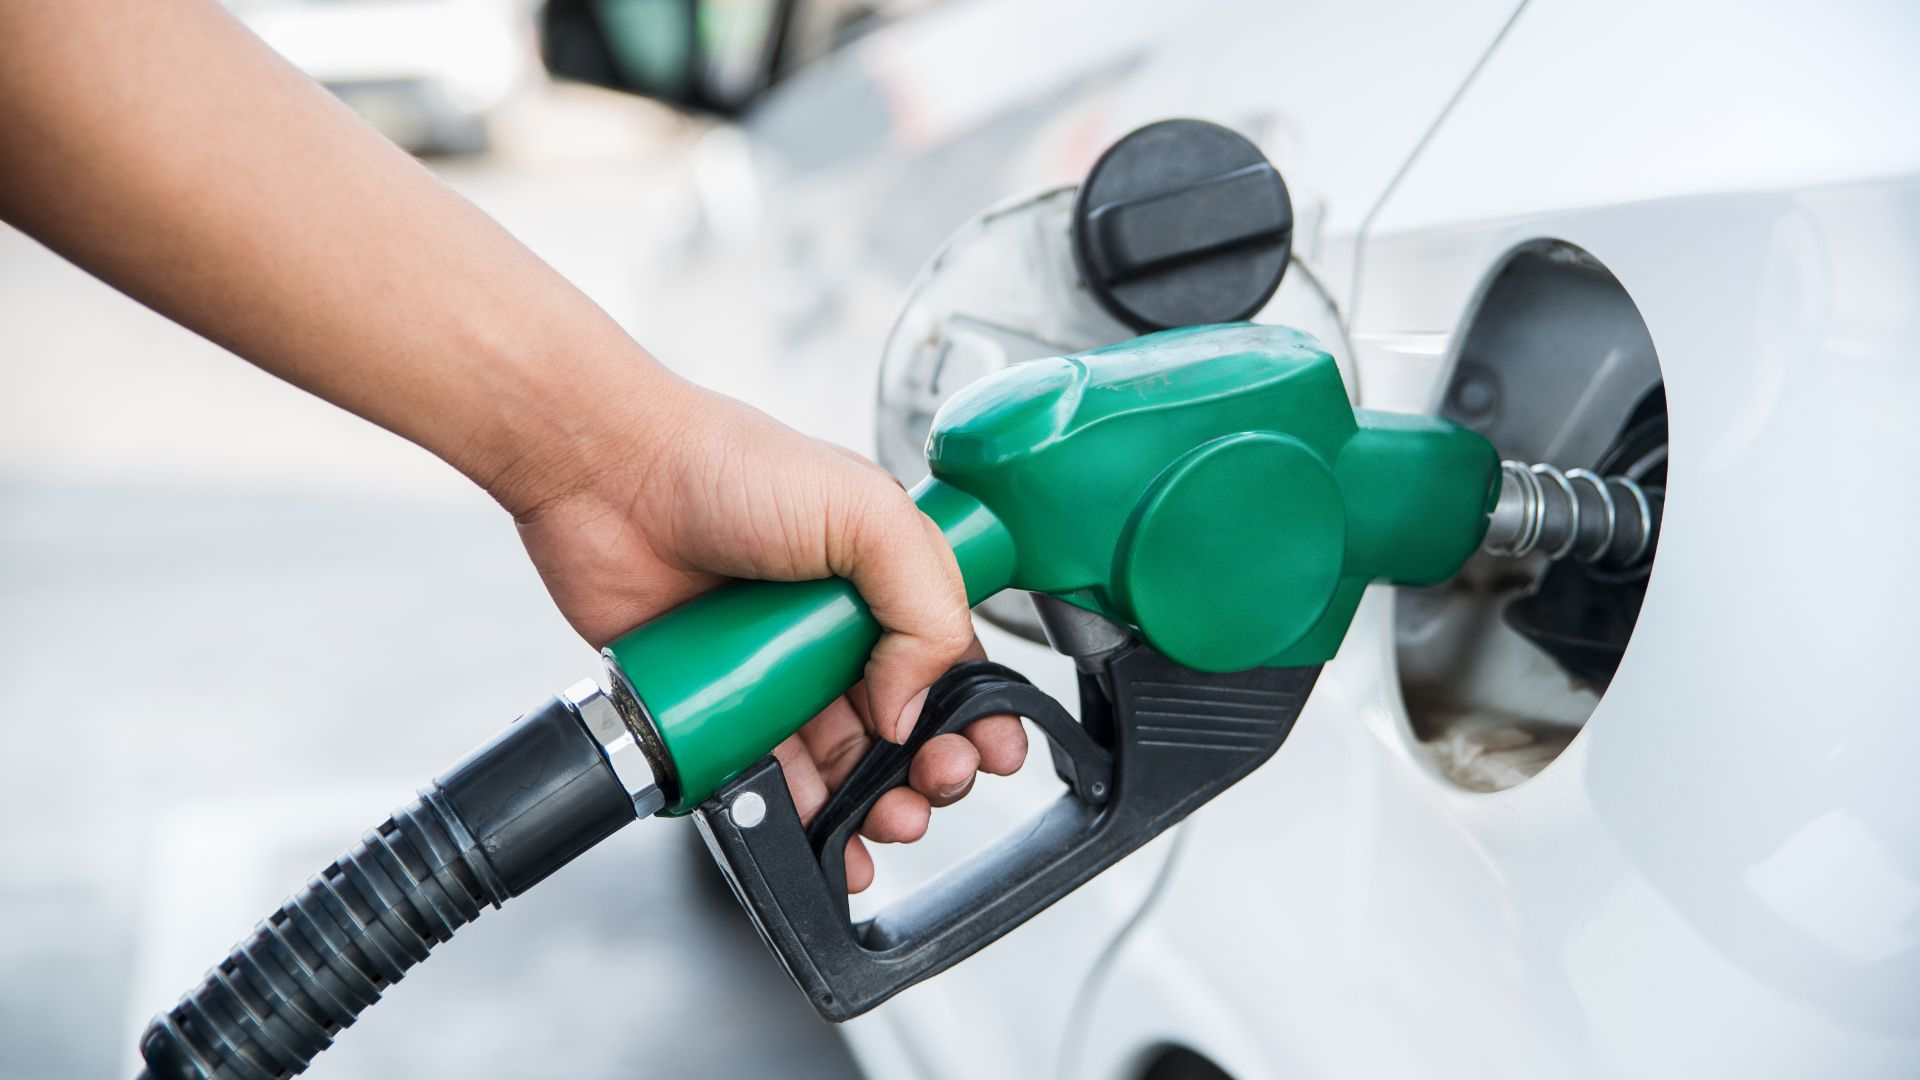 petrol pumps sexist, says London motorist